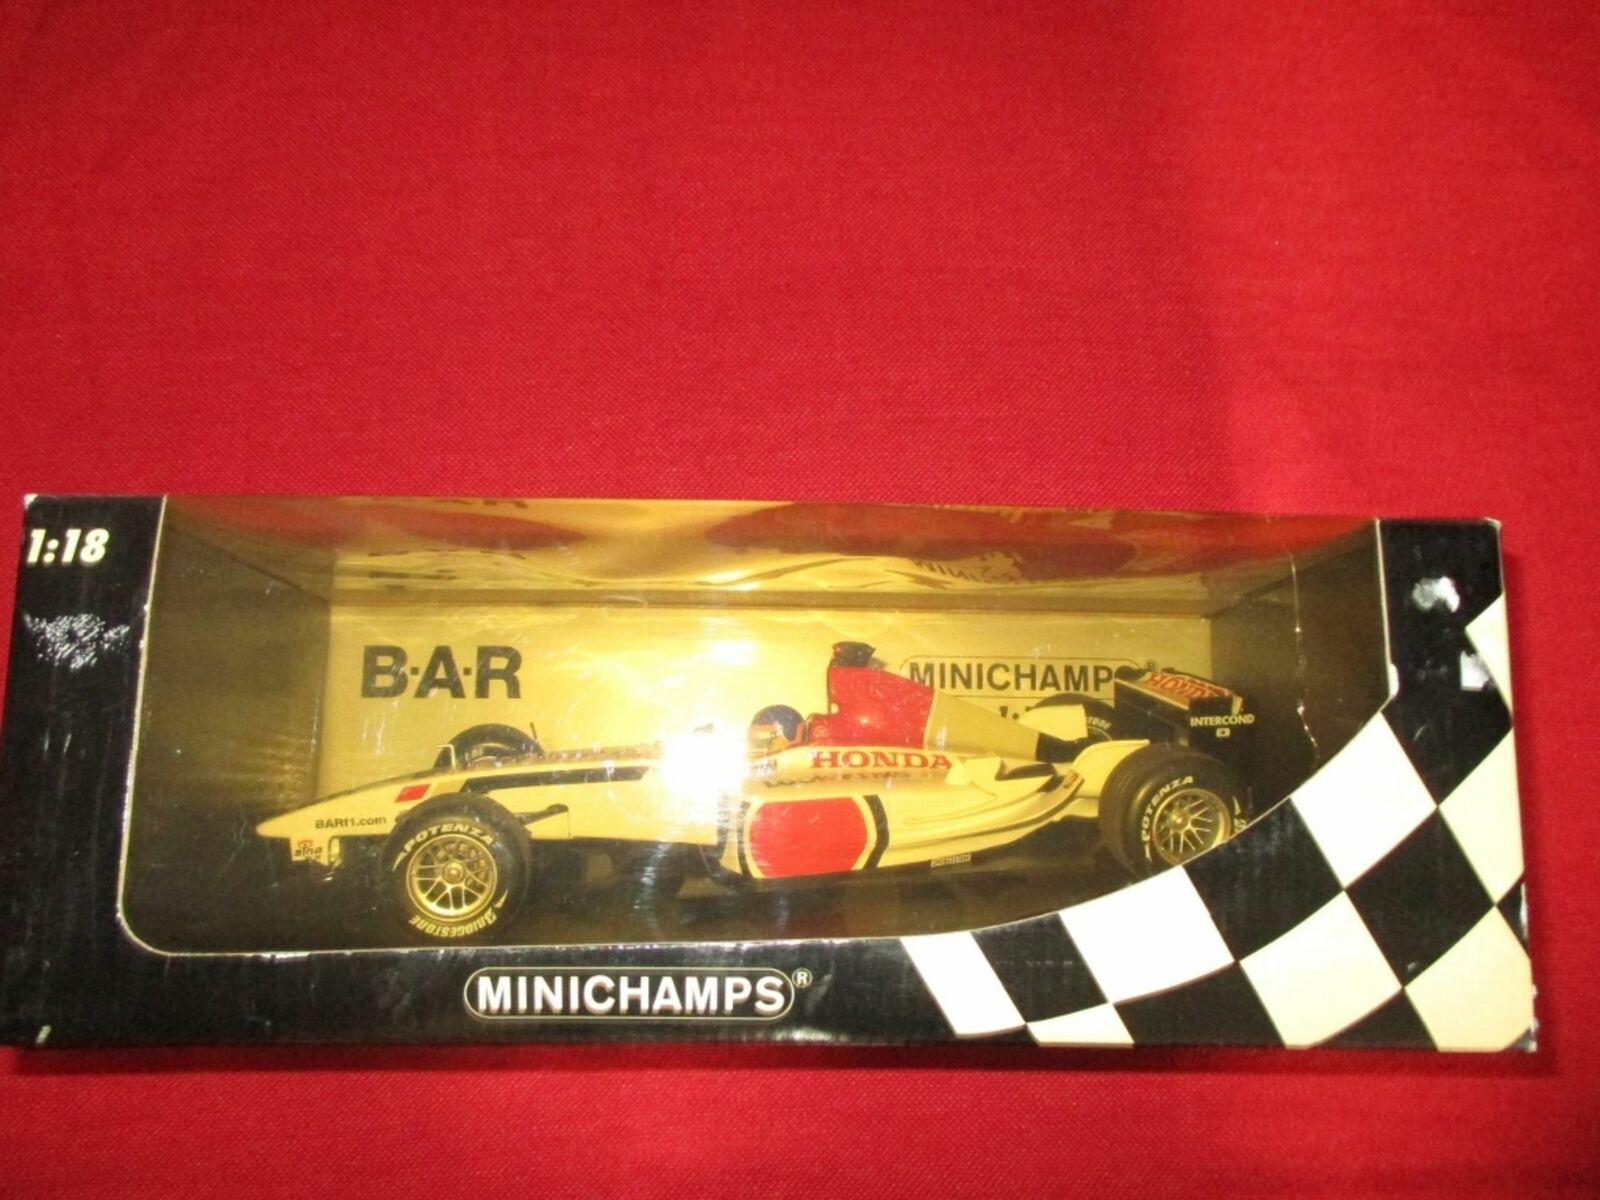 Minichamps ® 100 030016 1 18 b.a.r. honda 005 J. villeneuve nuevo embalaje original